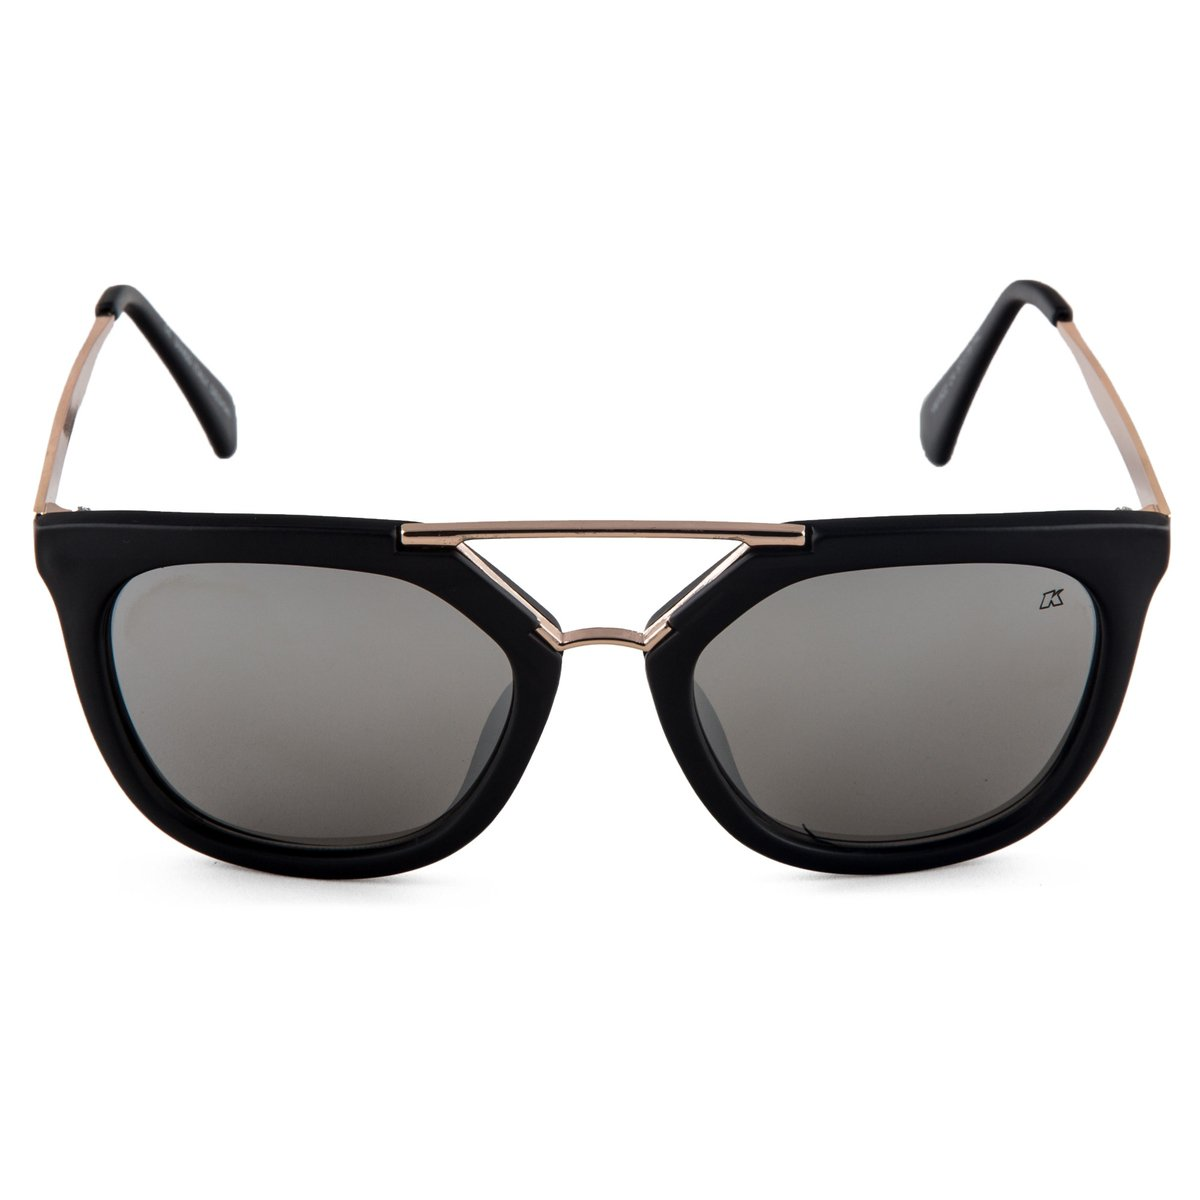 Óculos de Sol Khatto YM1522 - Compre Agora   Zattini bd2d32f6fa